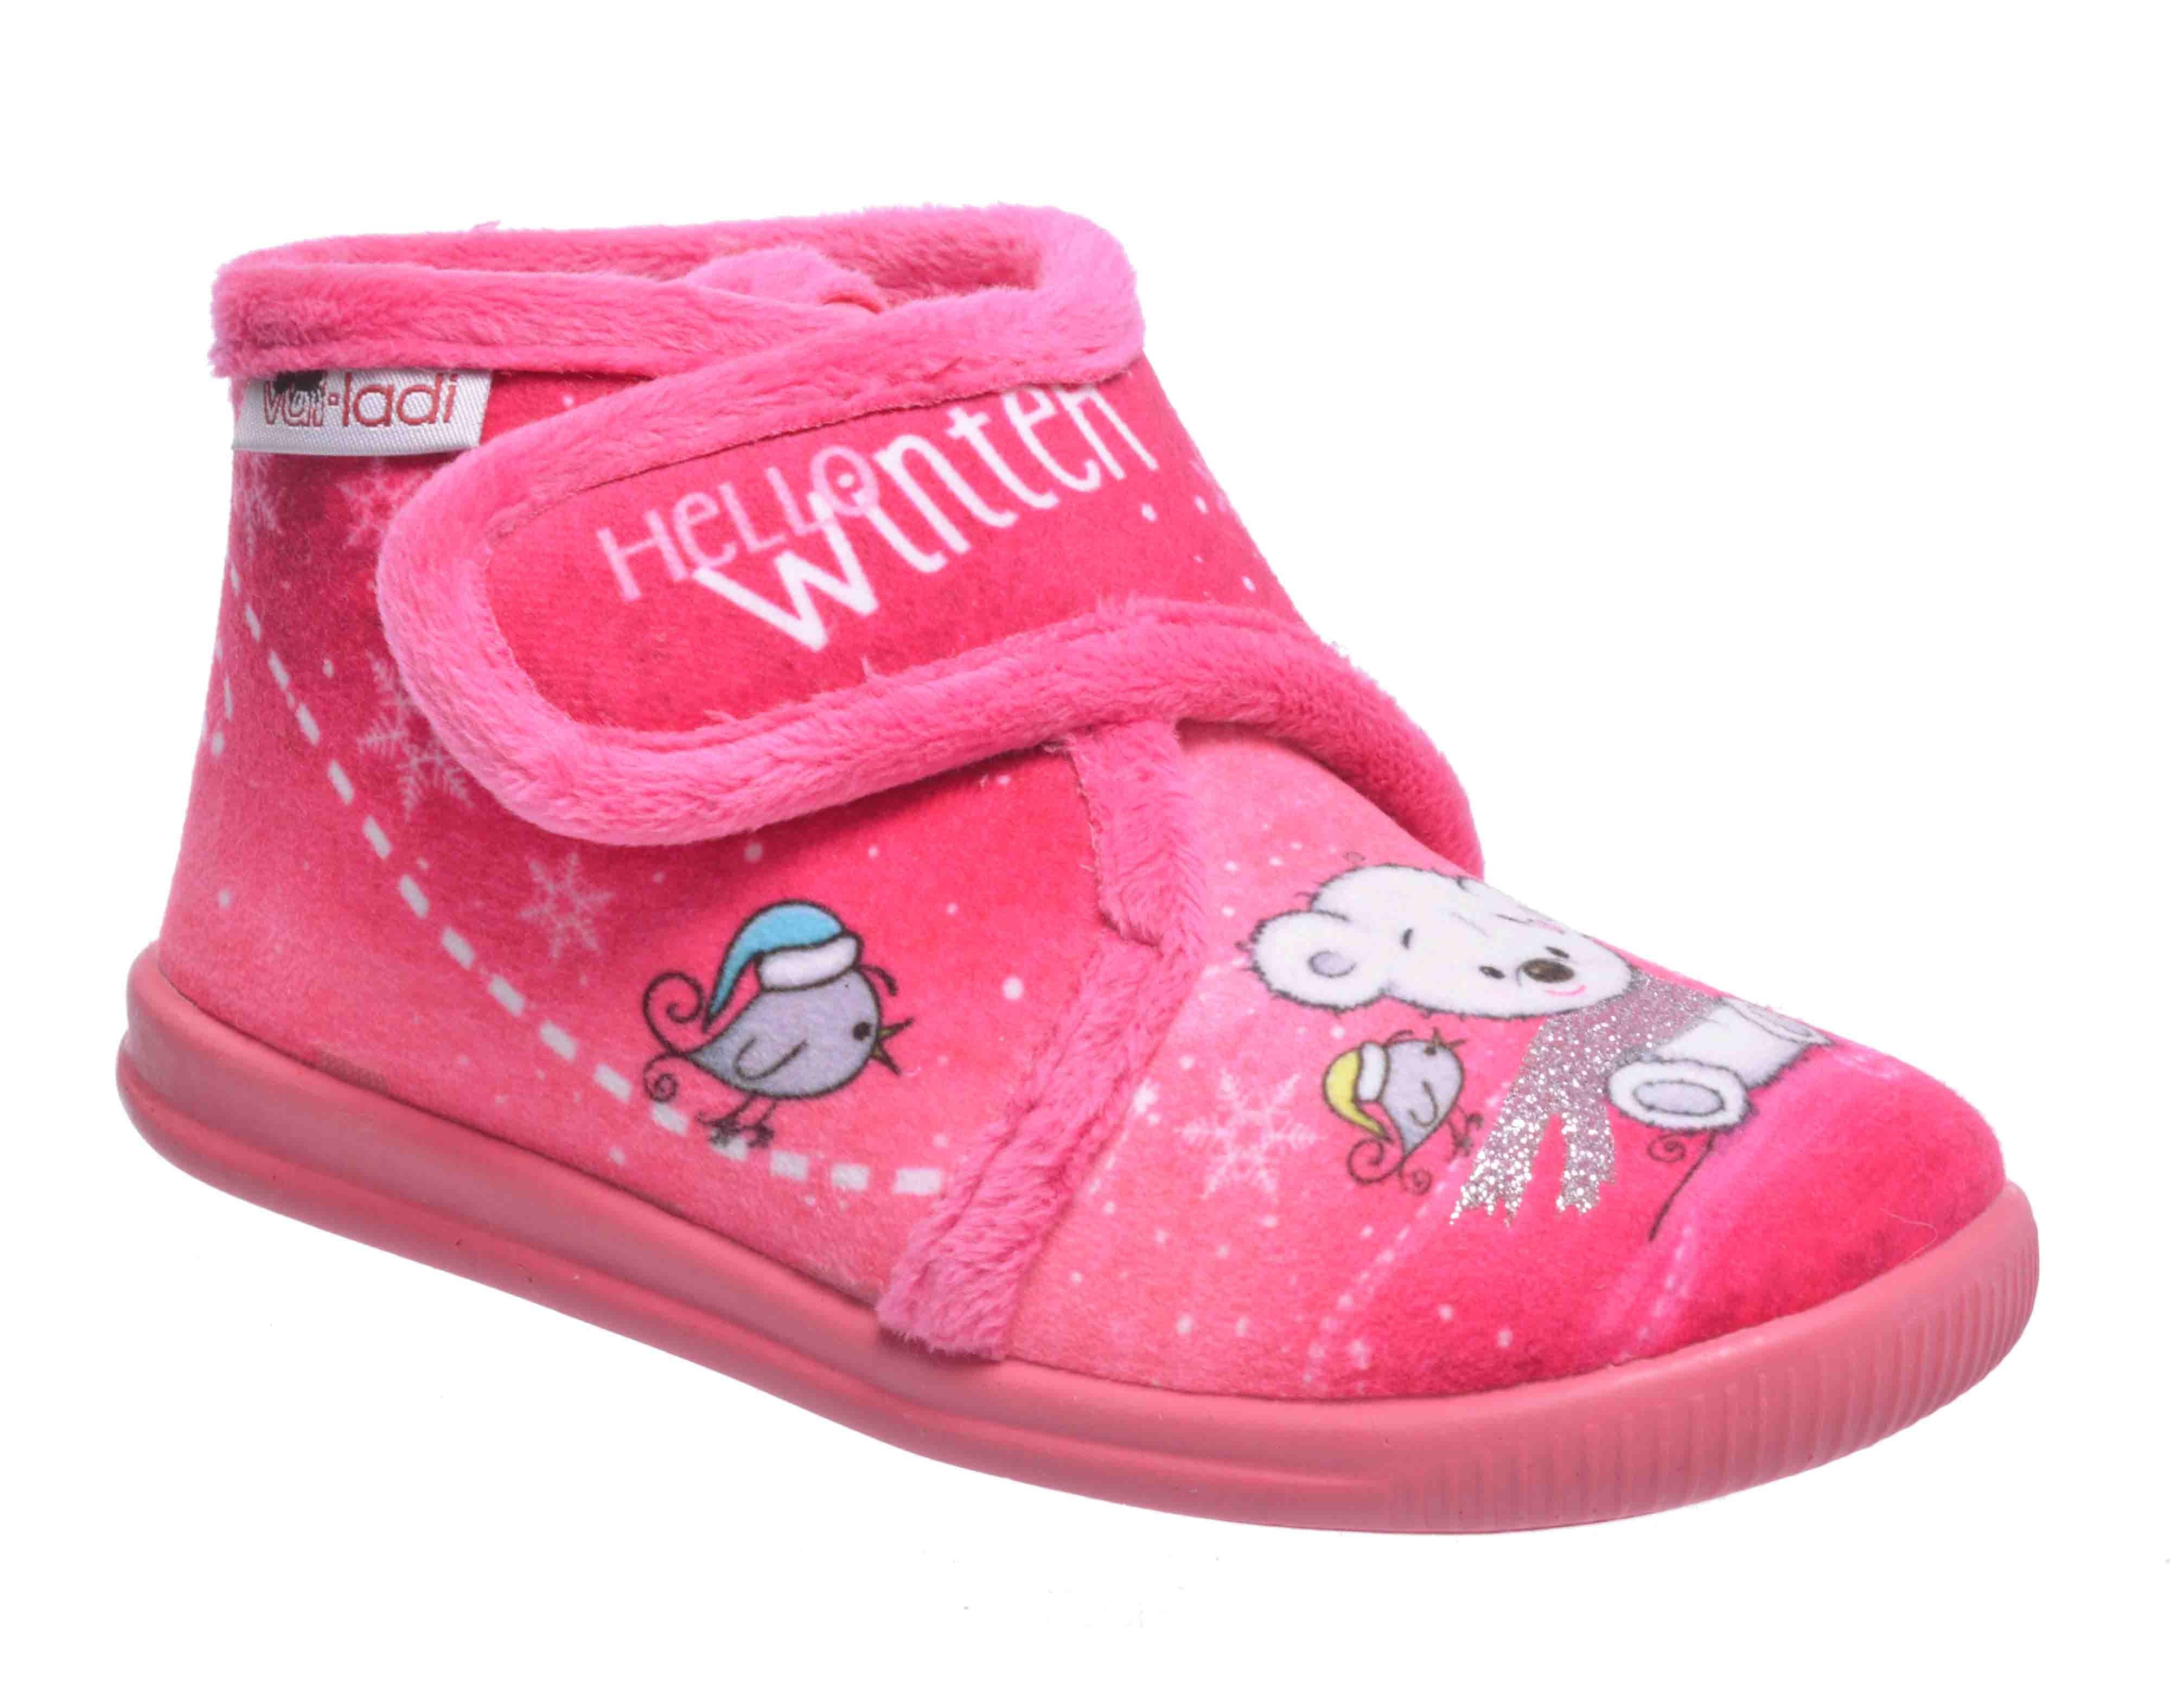 f39a137a64d Vul Ladi 1105-140 Φούξια | Apostolidis Shoes